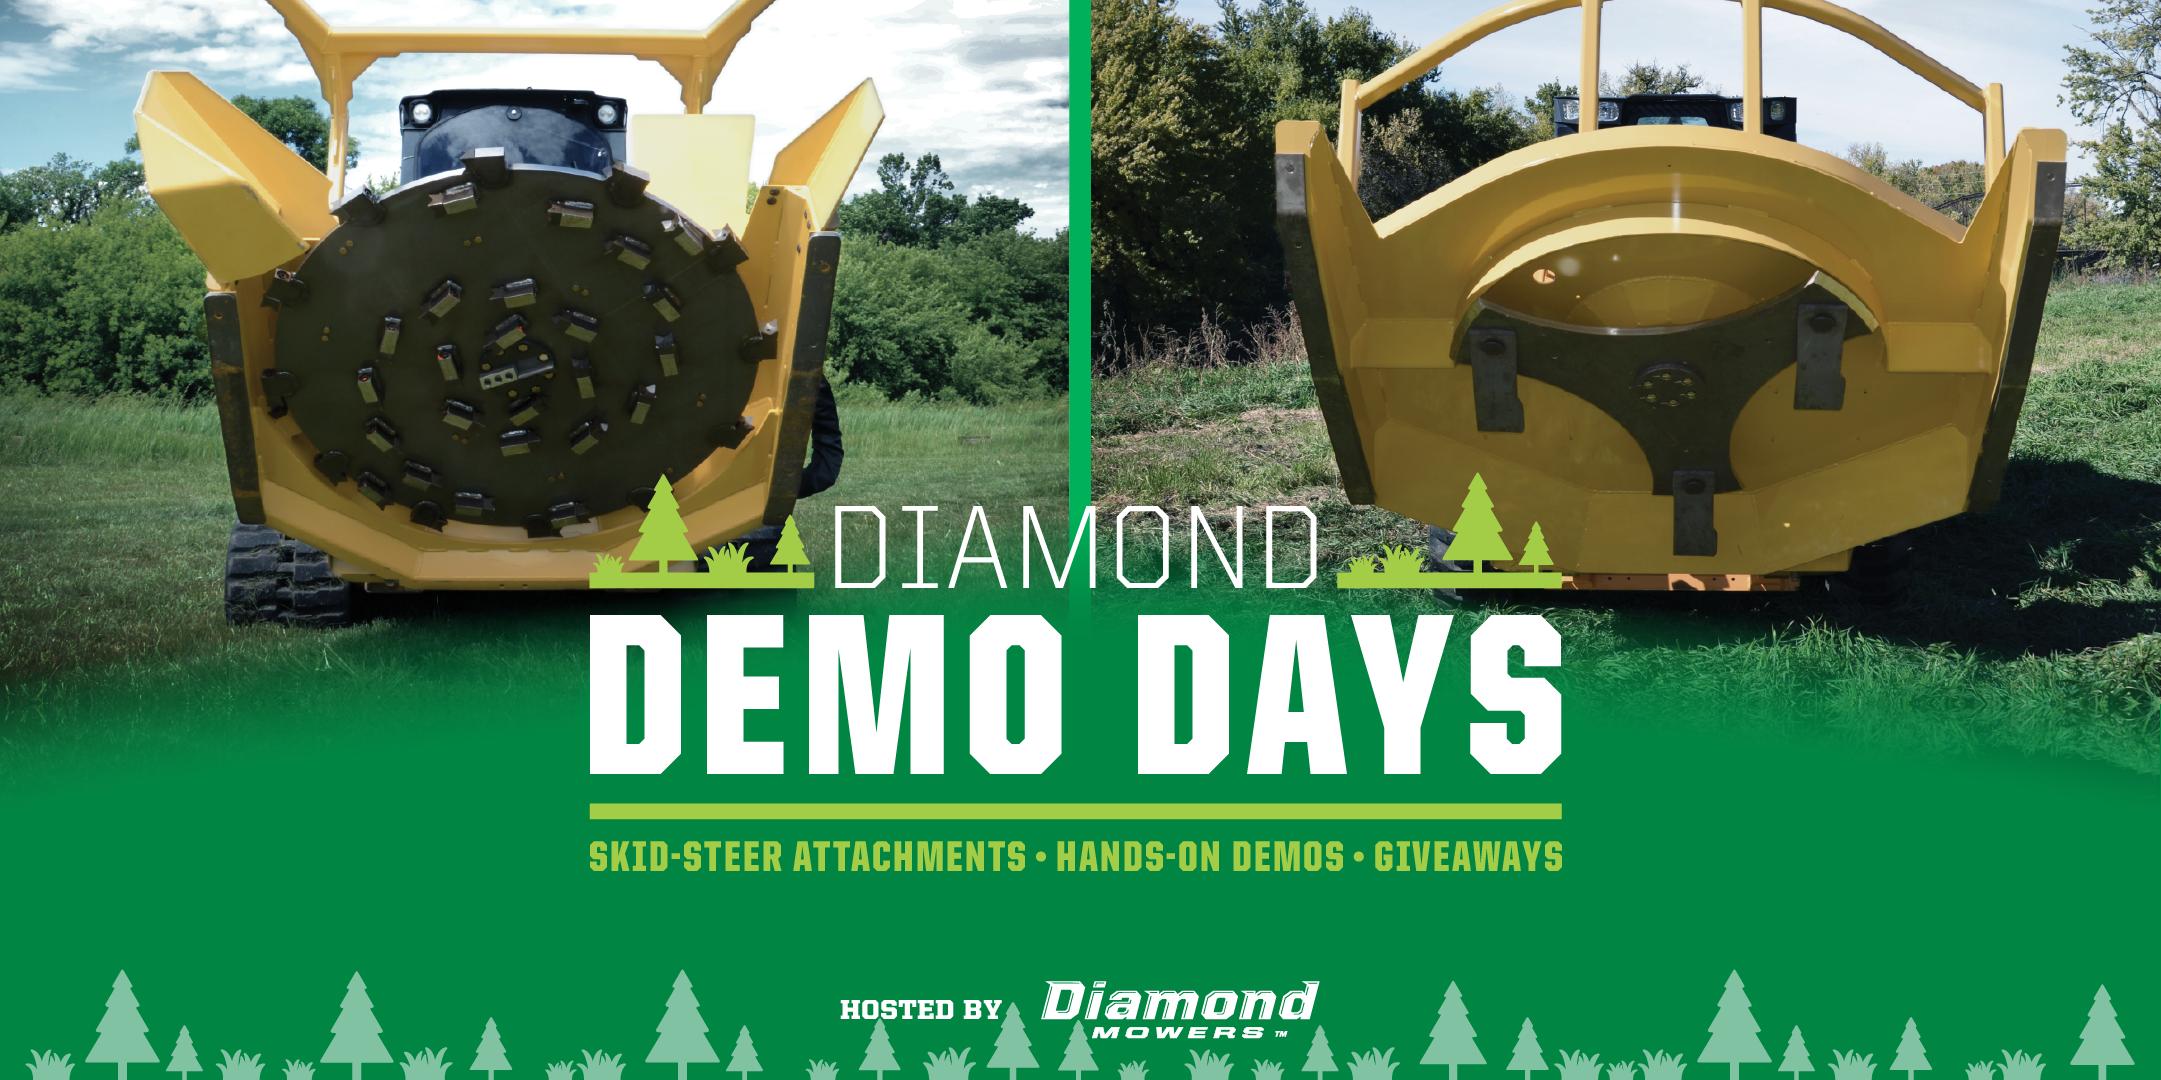 diamond-demo-days_landing-page-banner_2160x1080_v1.png